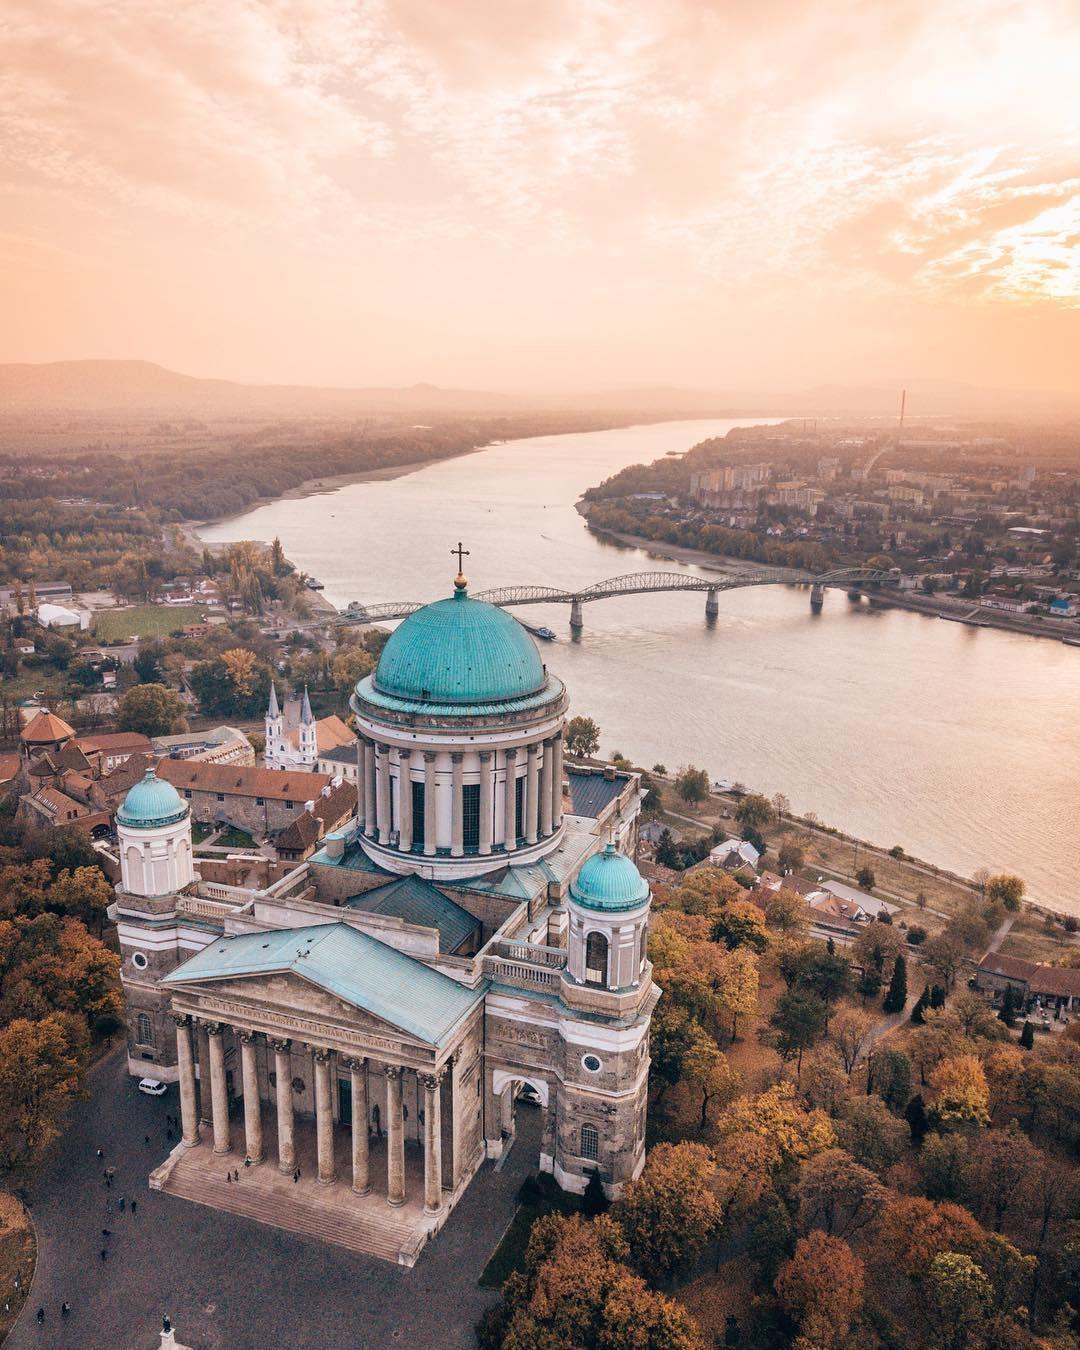 esztergom, hungary in 2019 | hungary travel, budapest